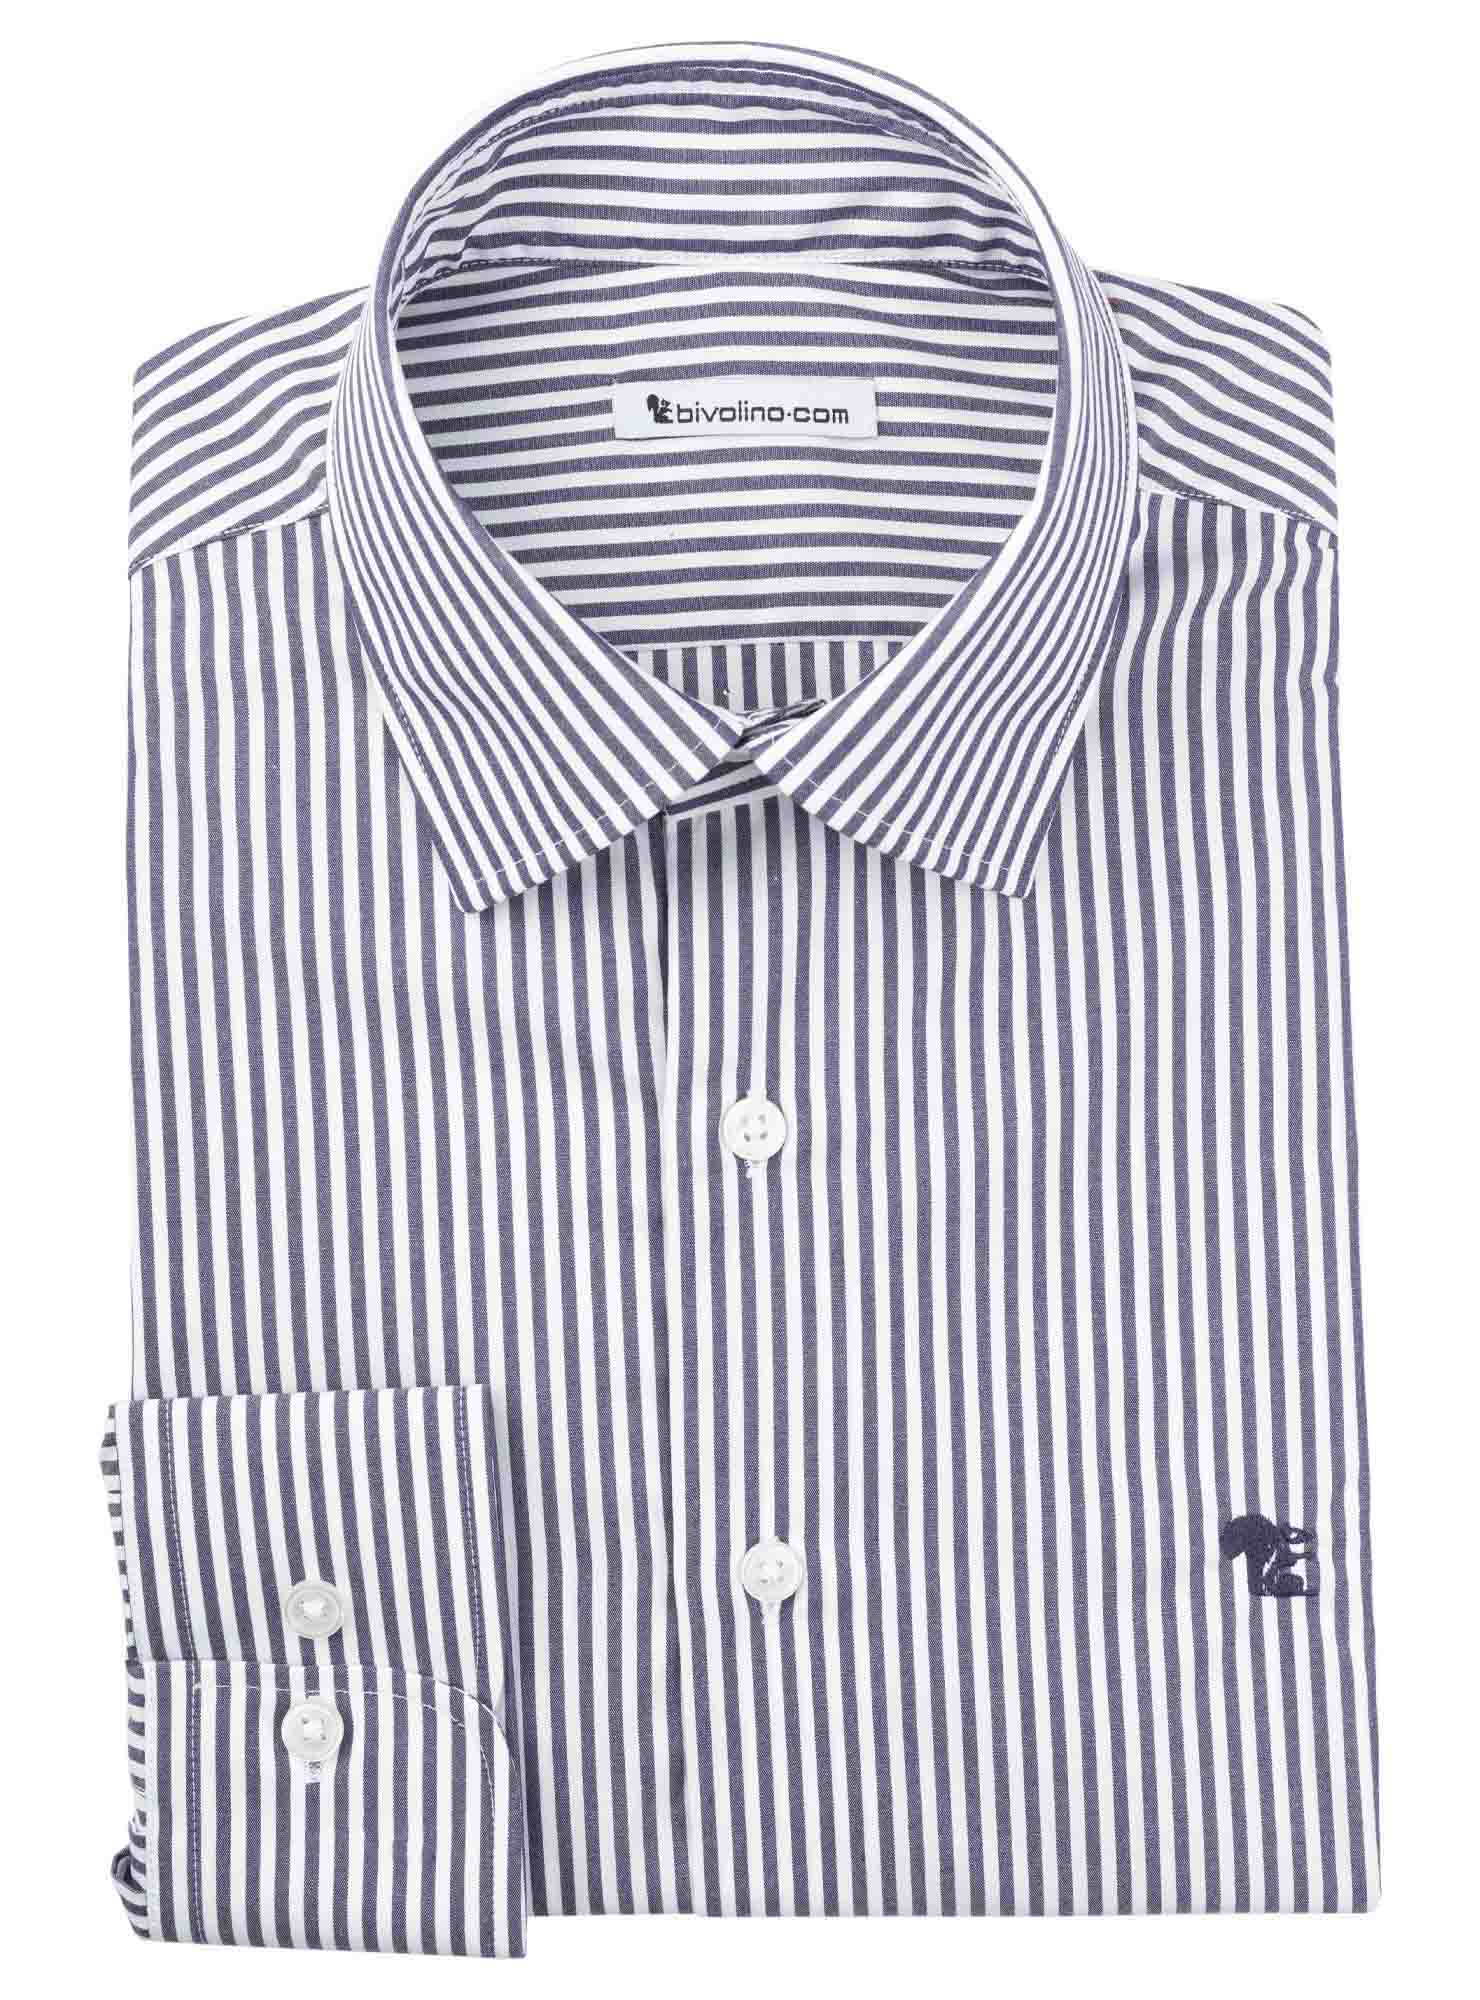 CAMPANIA - Poplin navy striped shirt - Rivo 2